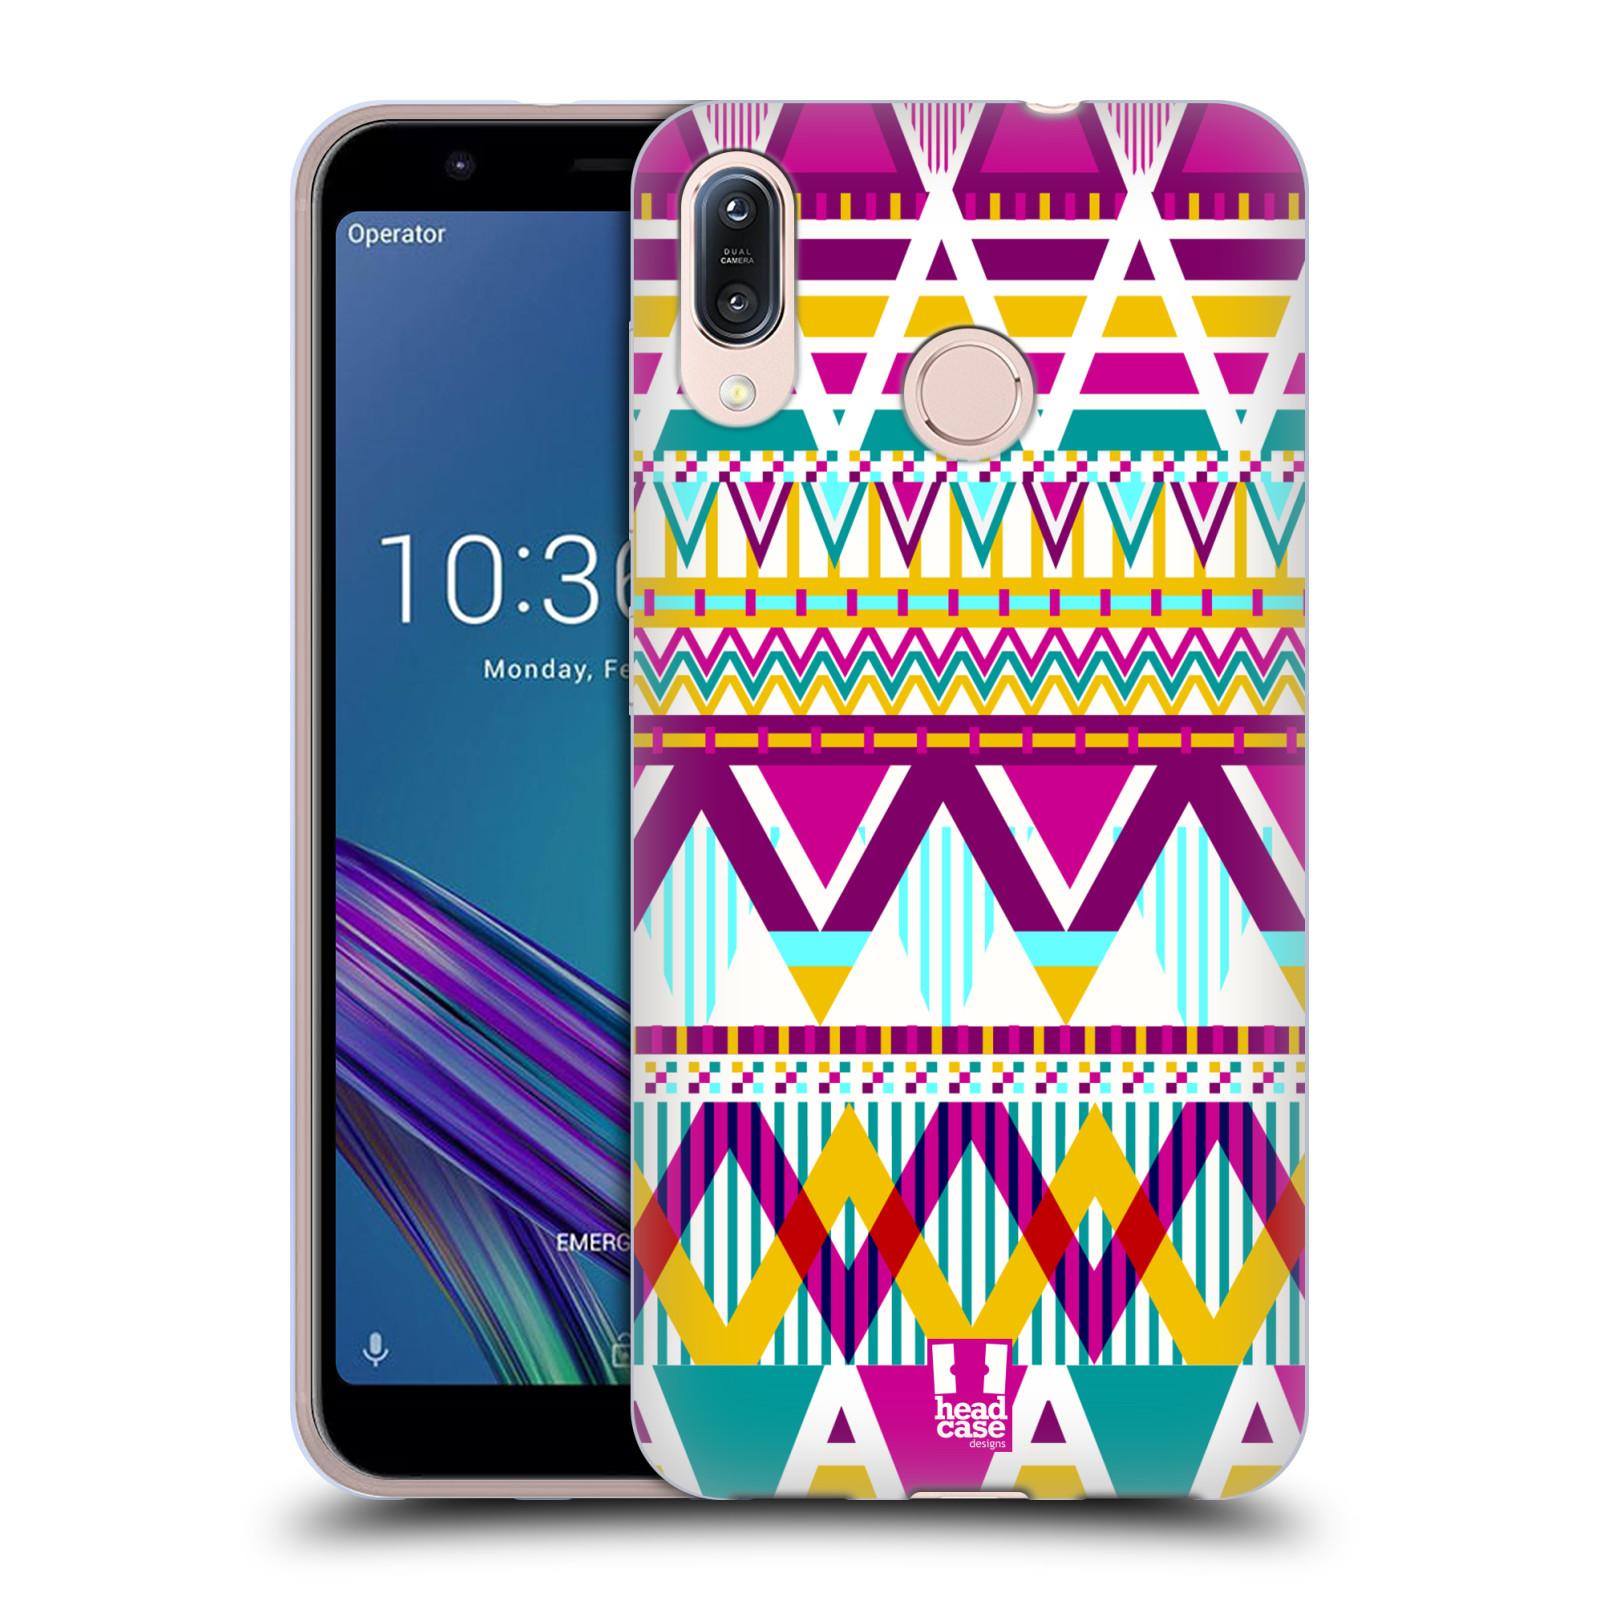 Silikonové pouzdro na mobil Asus Zenfone Max M1 ZB555KL - Head Case - AZTEC SUGARED